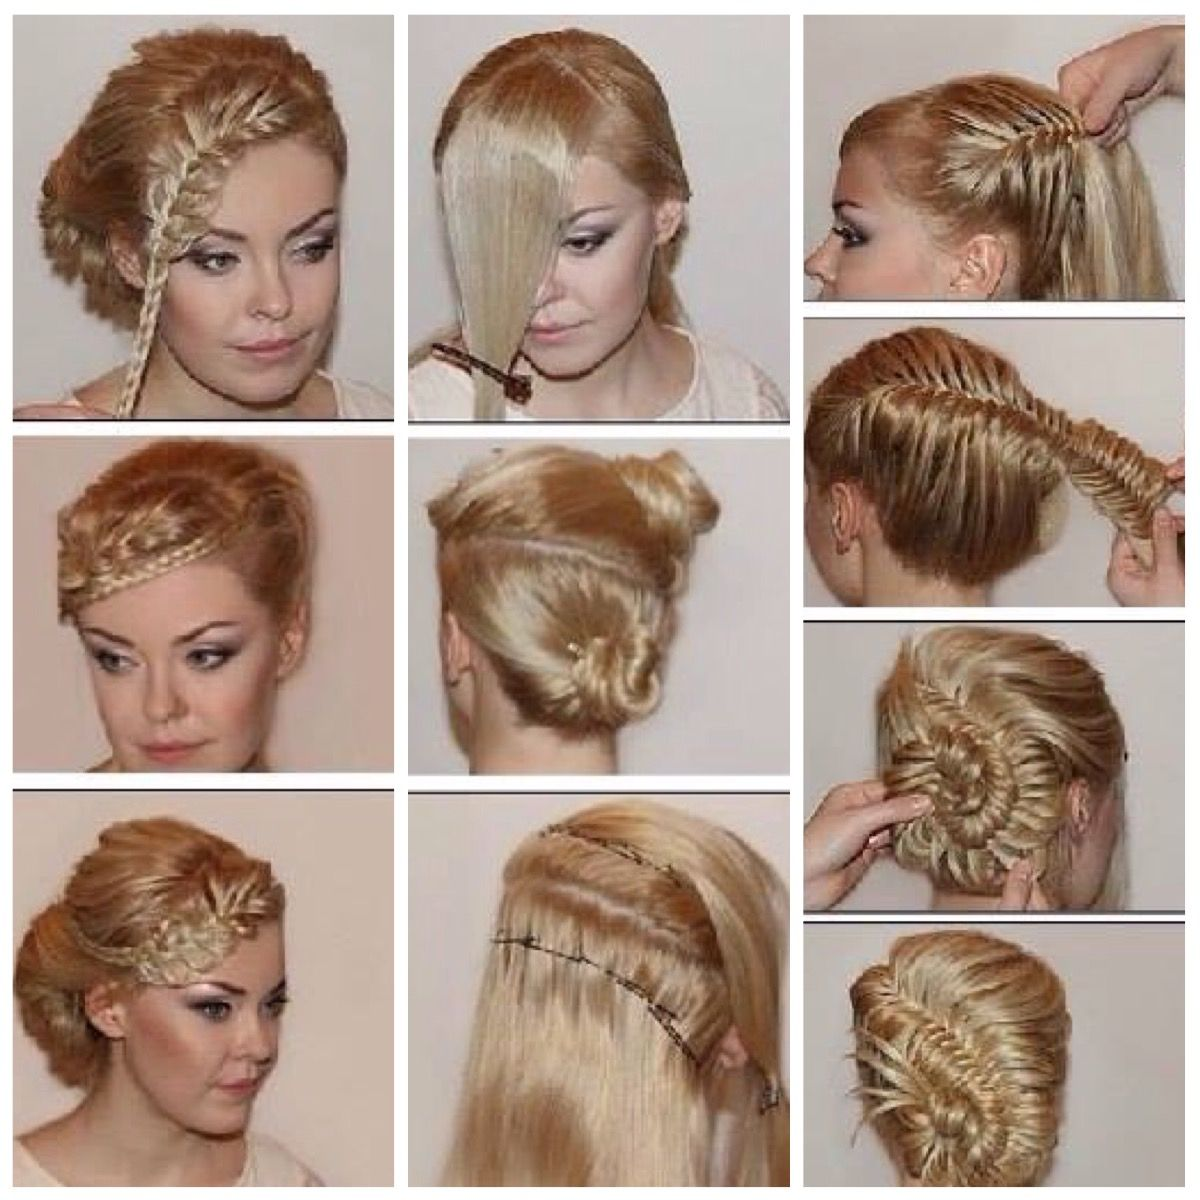 Hairstyle Tutorials Cool Pinhaydee On #hairtutorials And More  Pinterest  Hair